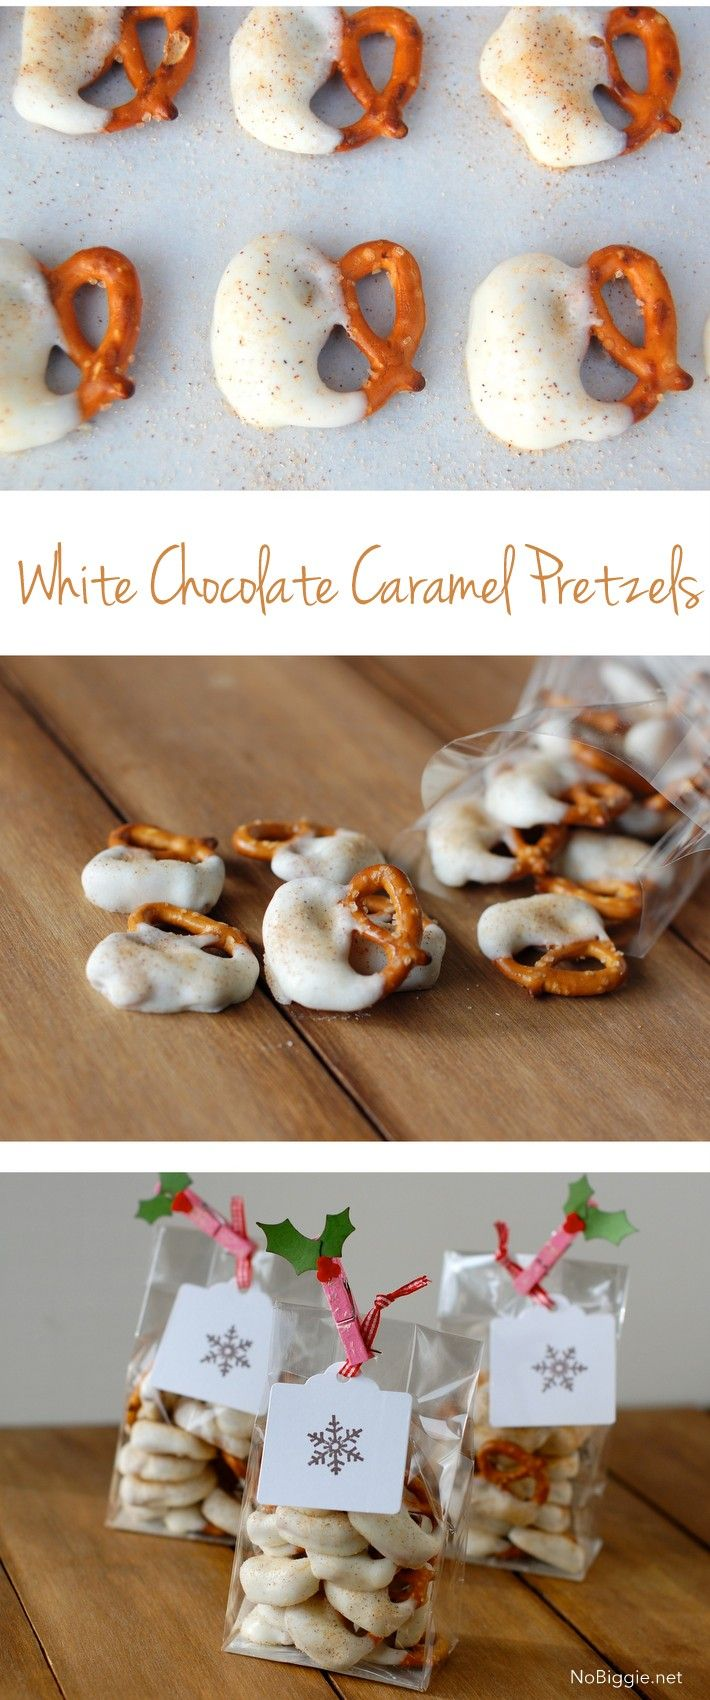 pretzels with white chocolate caramel and cinnamon - recipe on NoBiggie.net